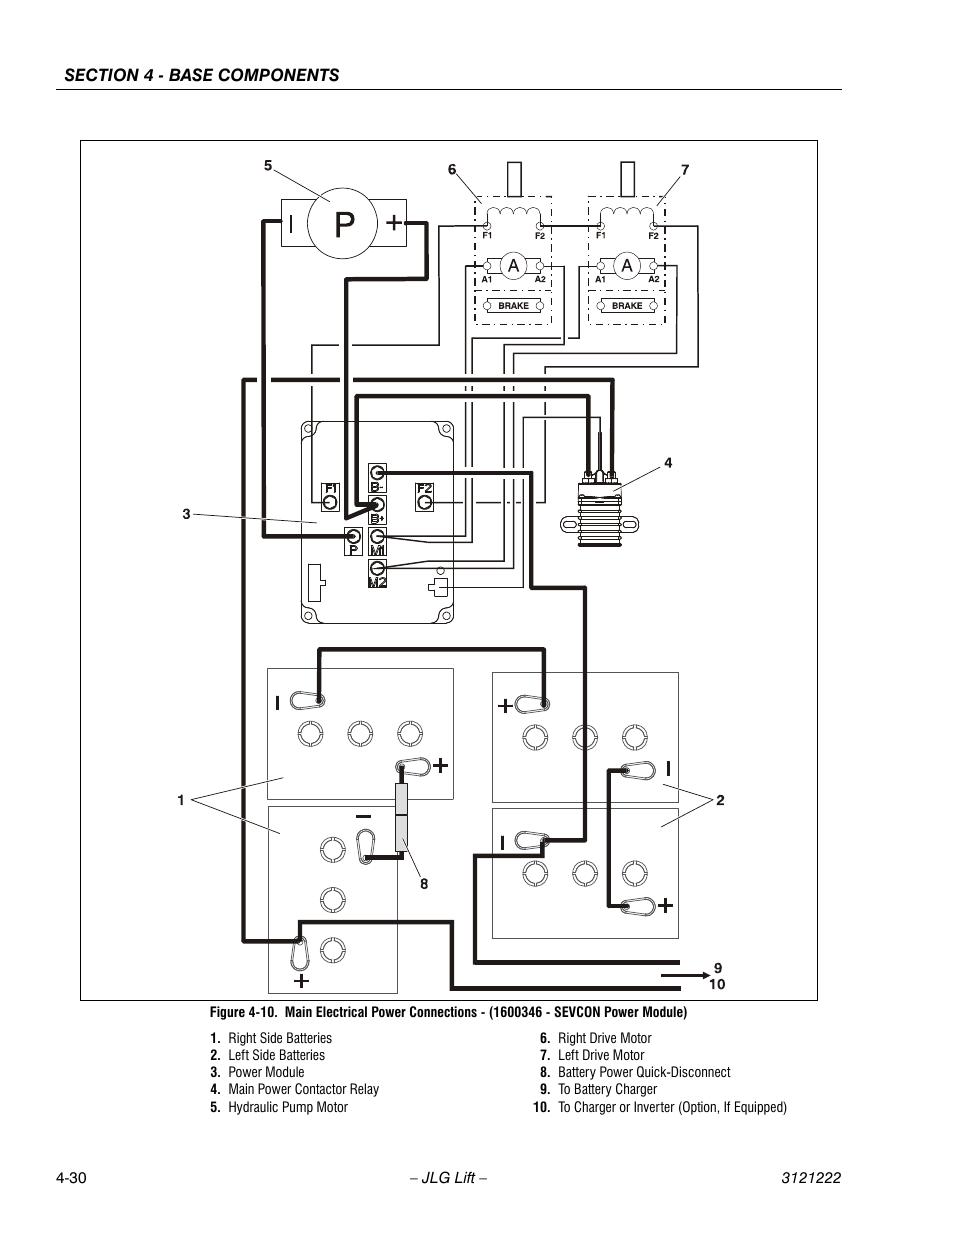 jlg 1230es service manual user manual